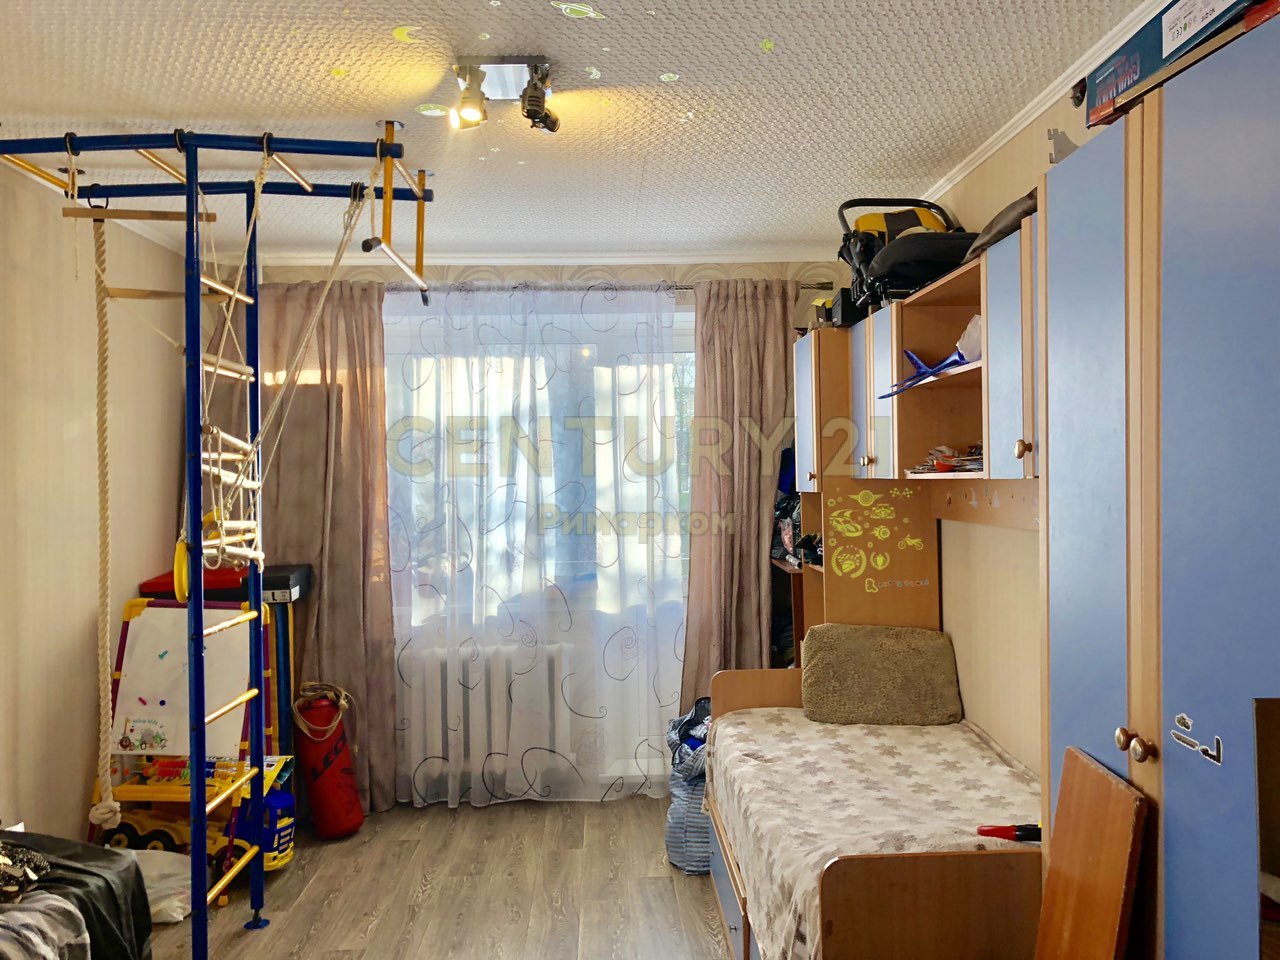 Продается двухкомнатная квартира за 2 600 000 рублей. Московская обл, г Чехов, ул Маркова, д 1/3.